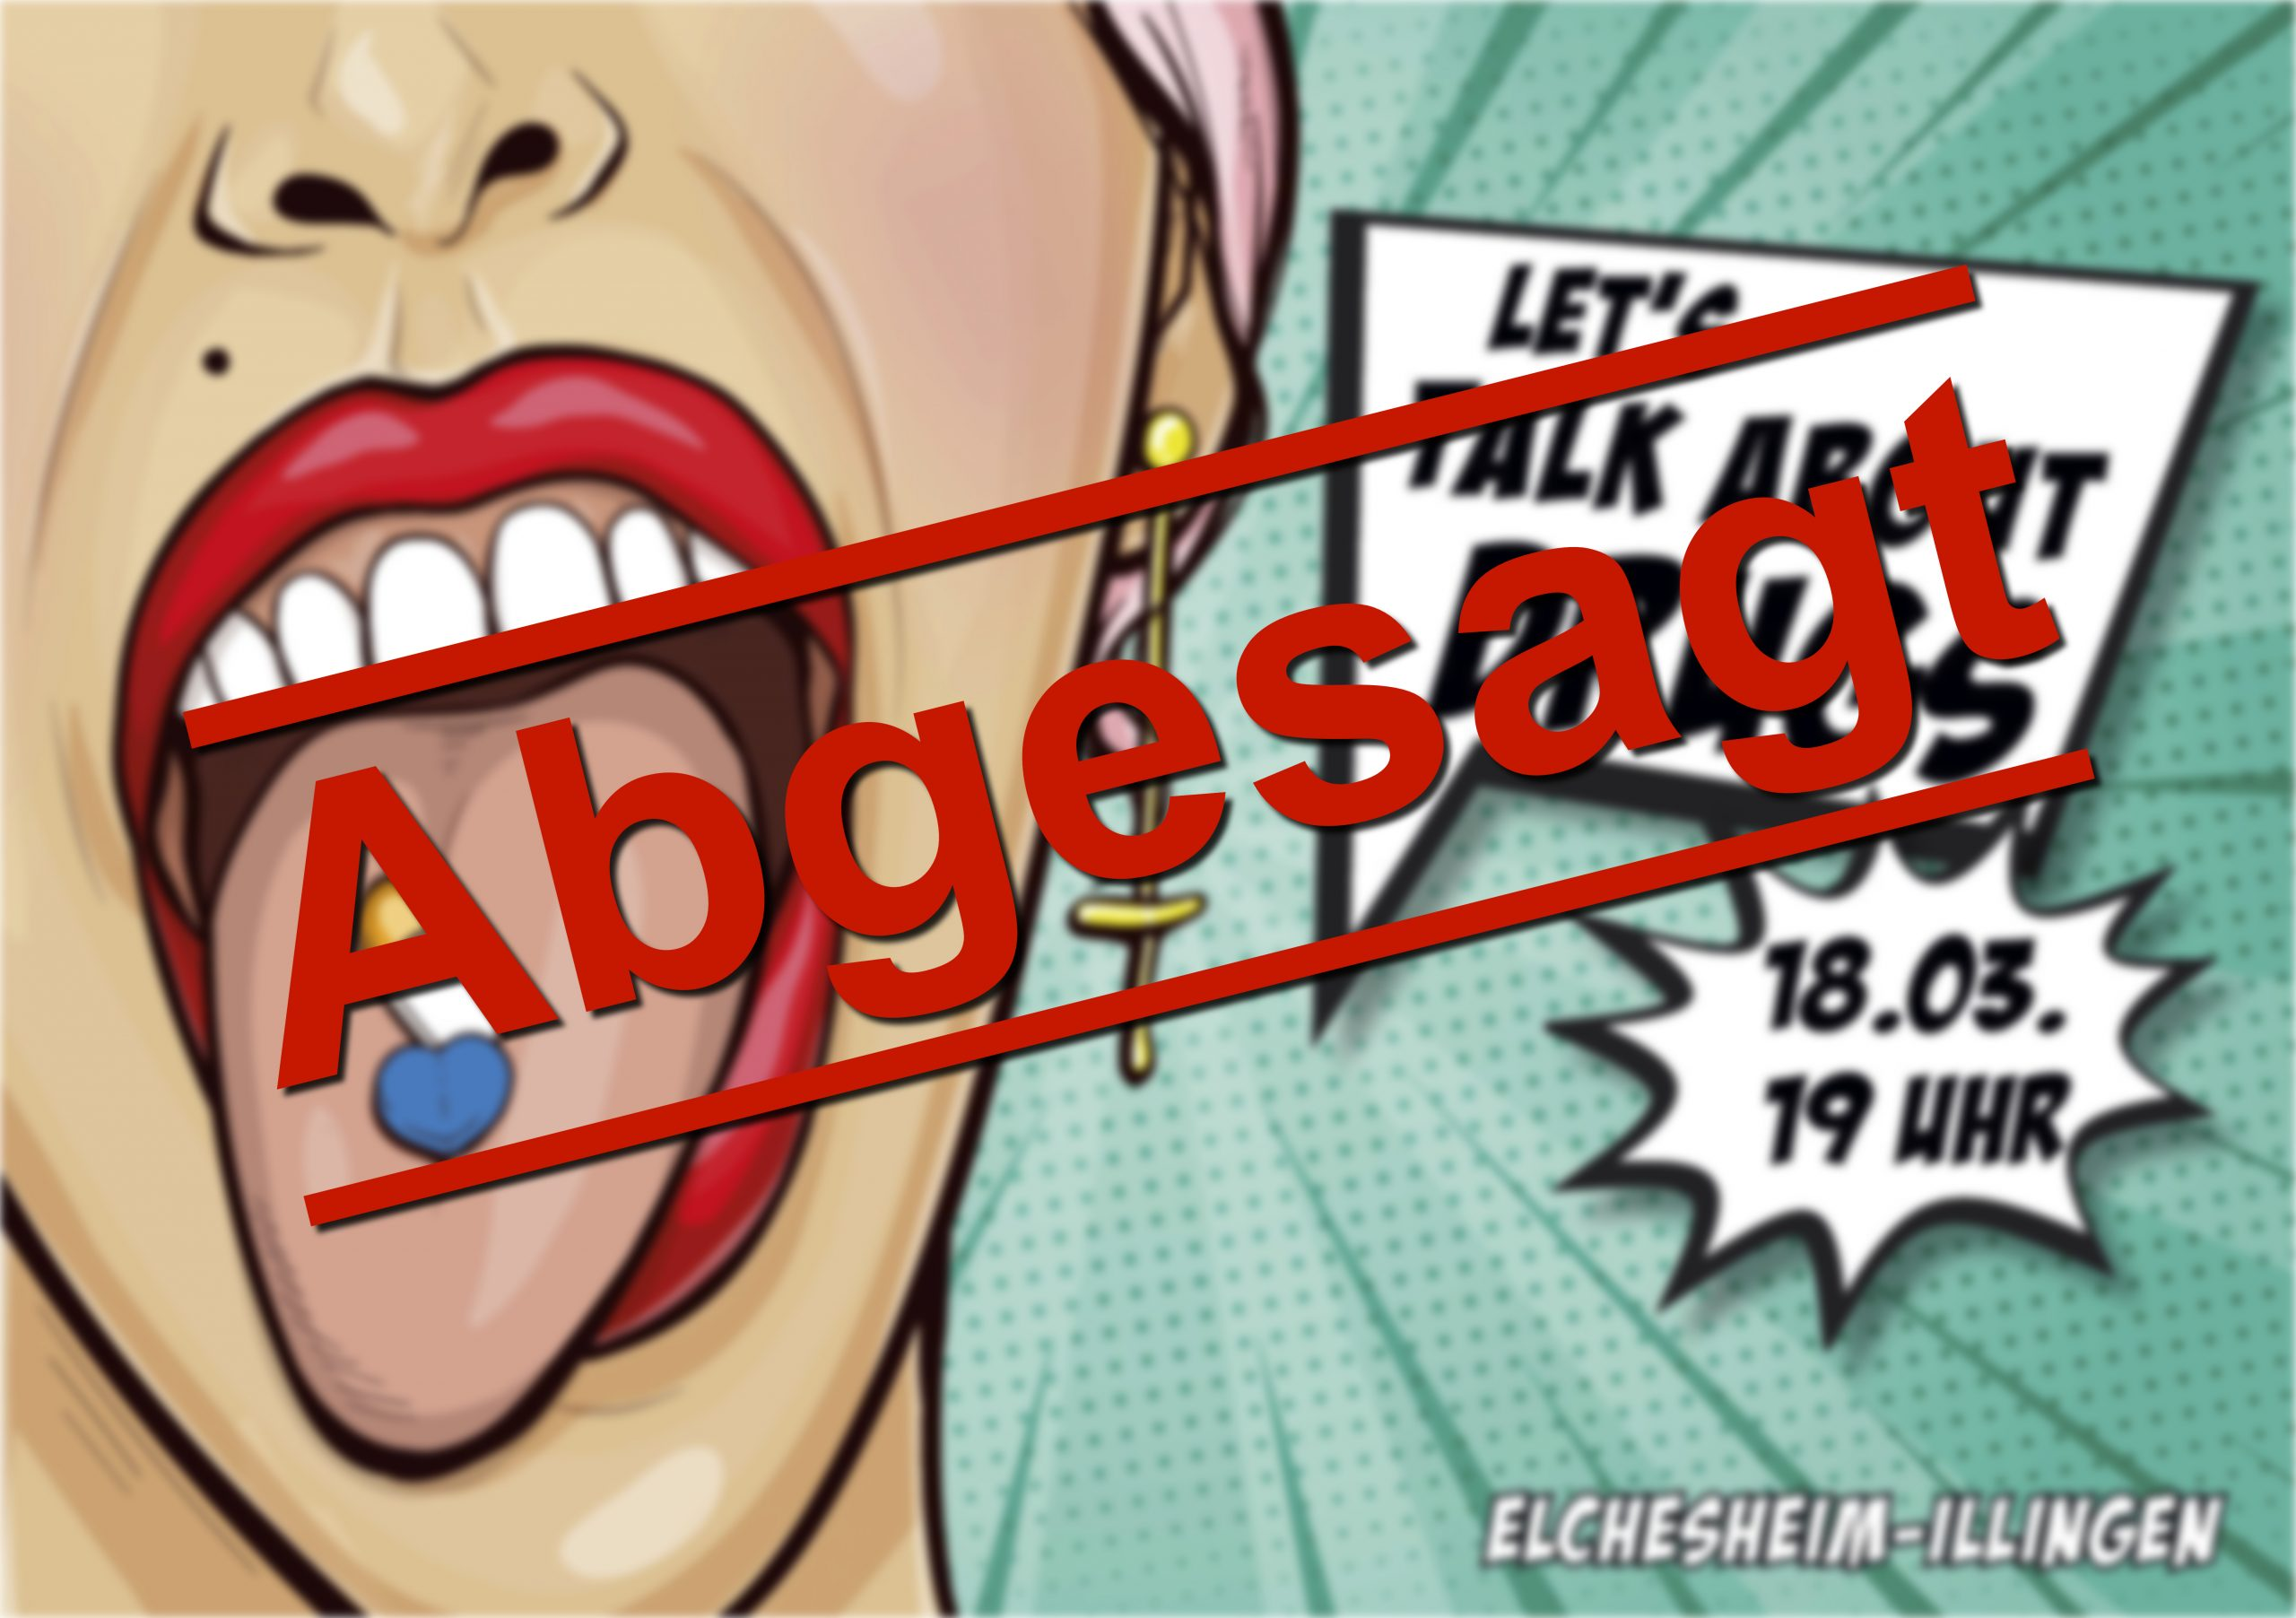 Let´s talk about drugs – abgesagt!